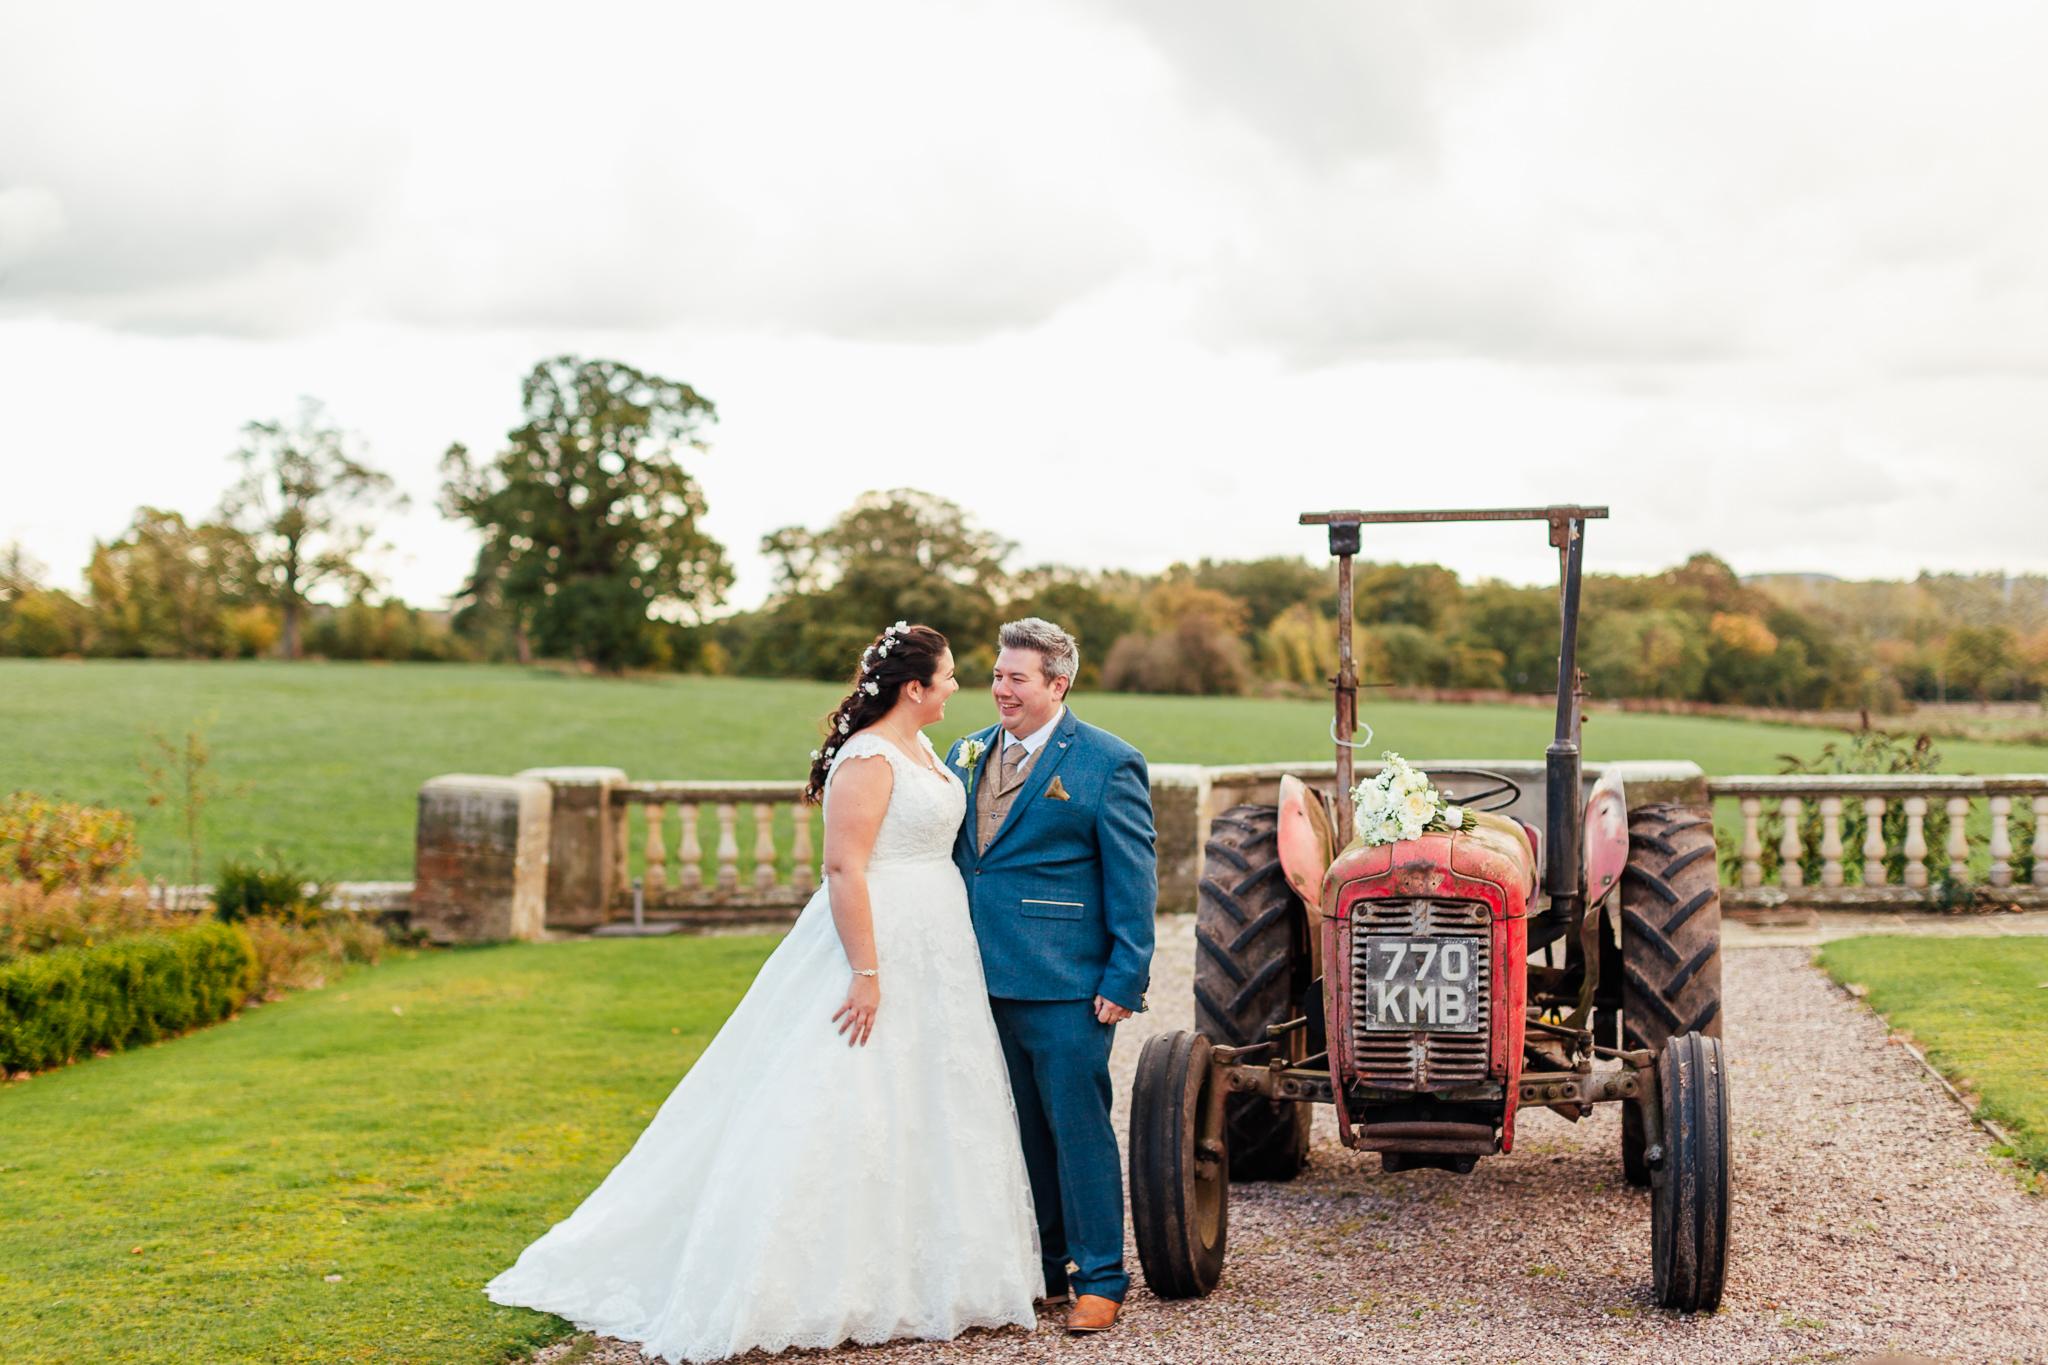 Willington-Hall-Cheshire-Wedding-25.jpg